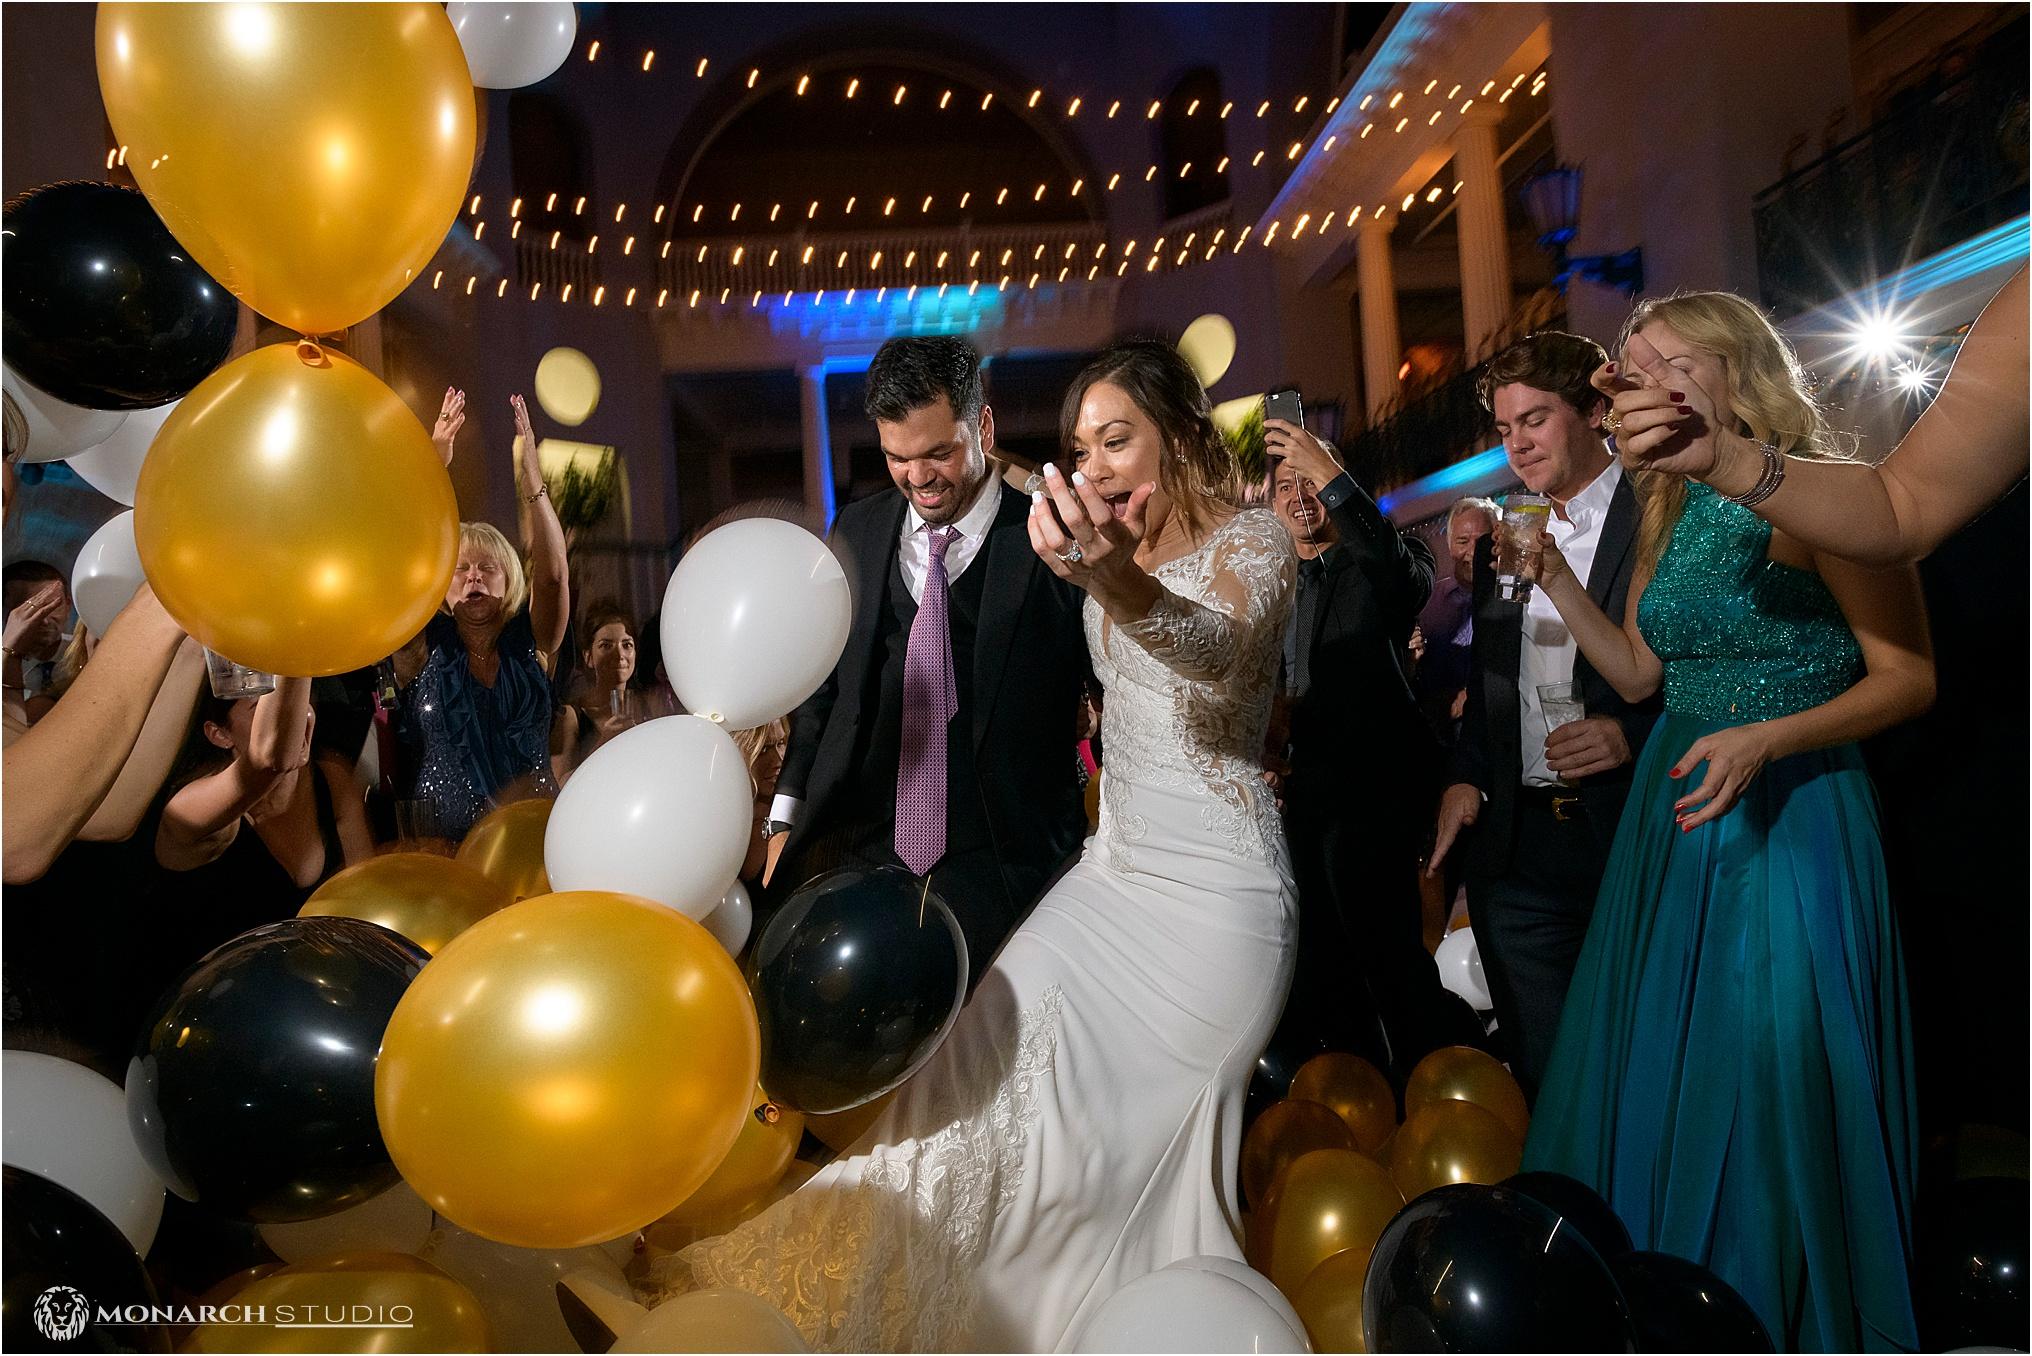 st-augustine-high-end-wedding-photographers-156.jpg